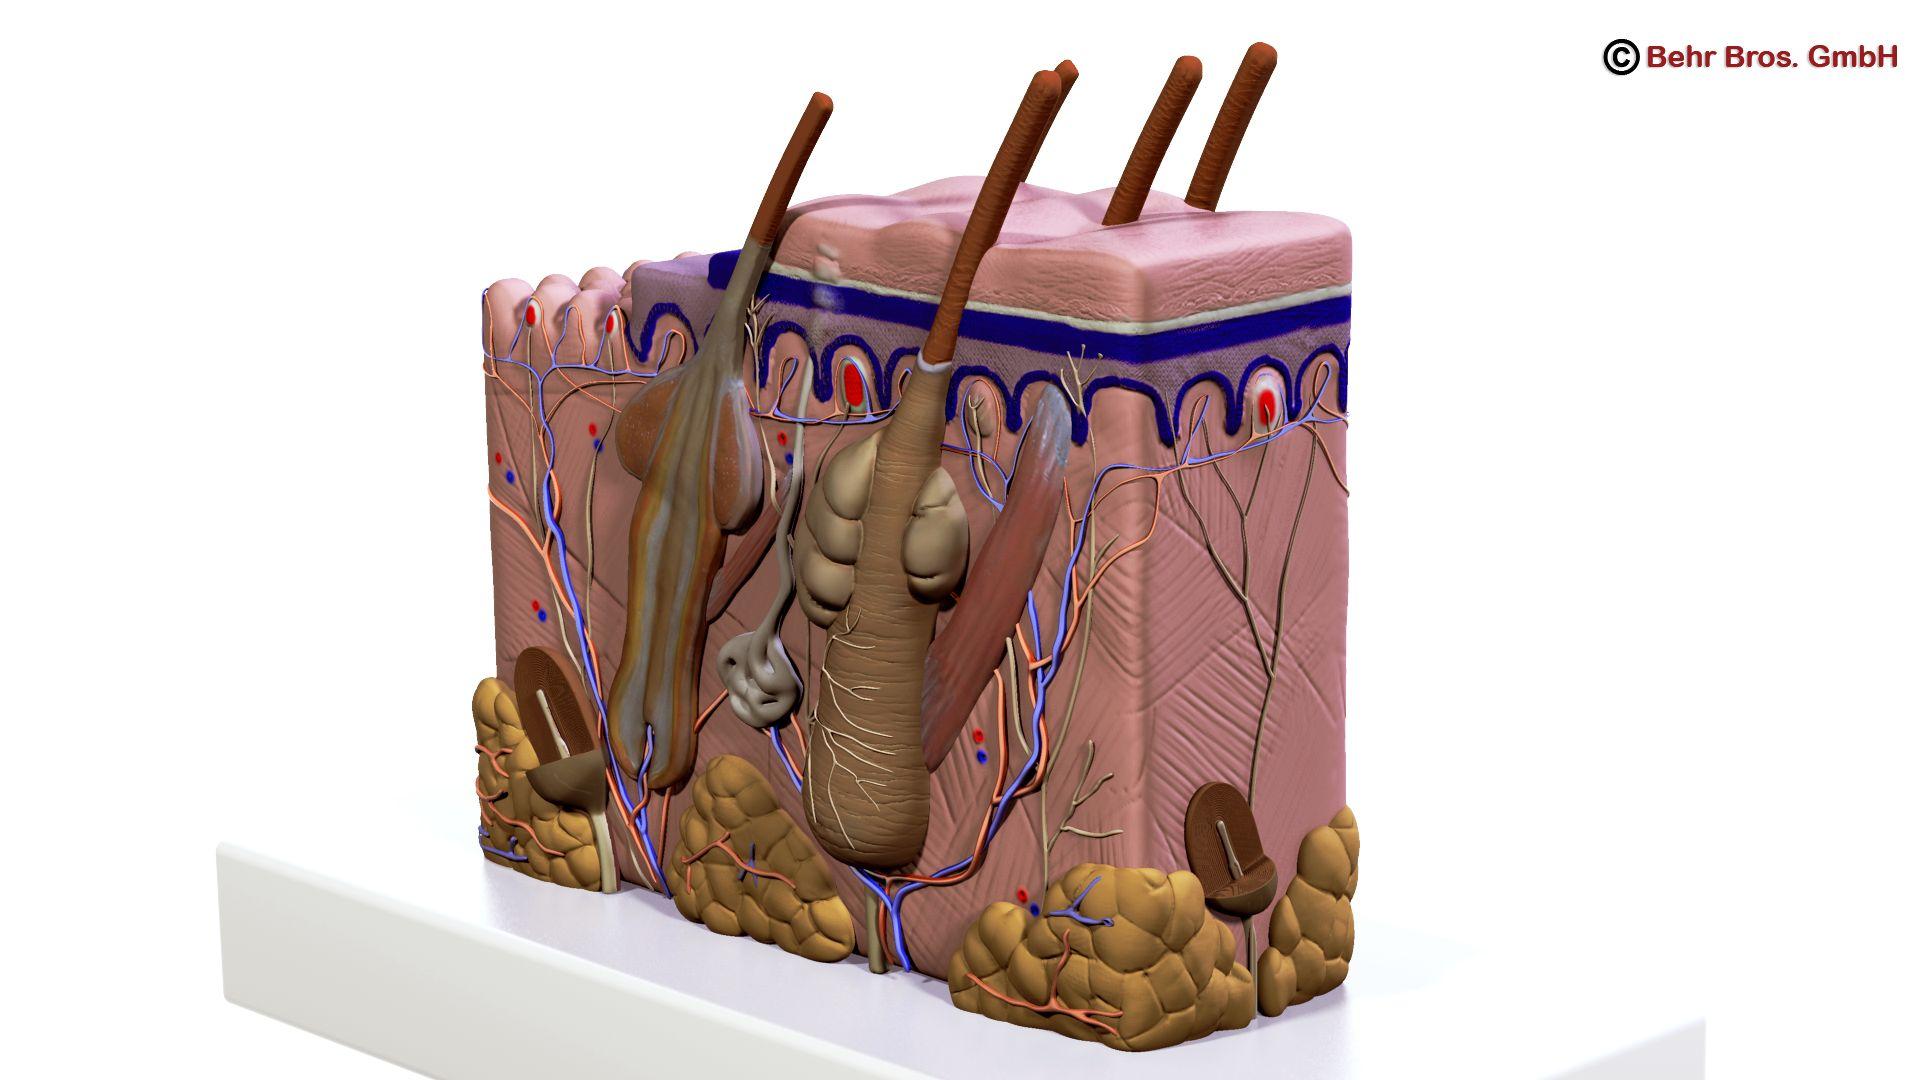 Human Skin Section 3d model 3ds max fbx c4d lwo lws lw ma mb obj 161733